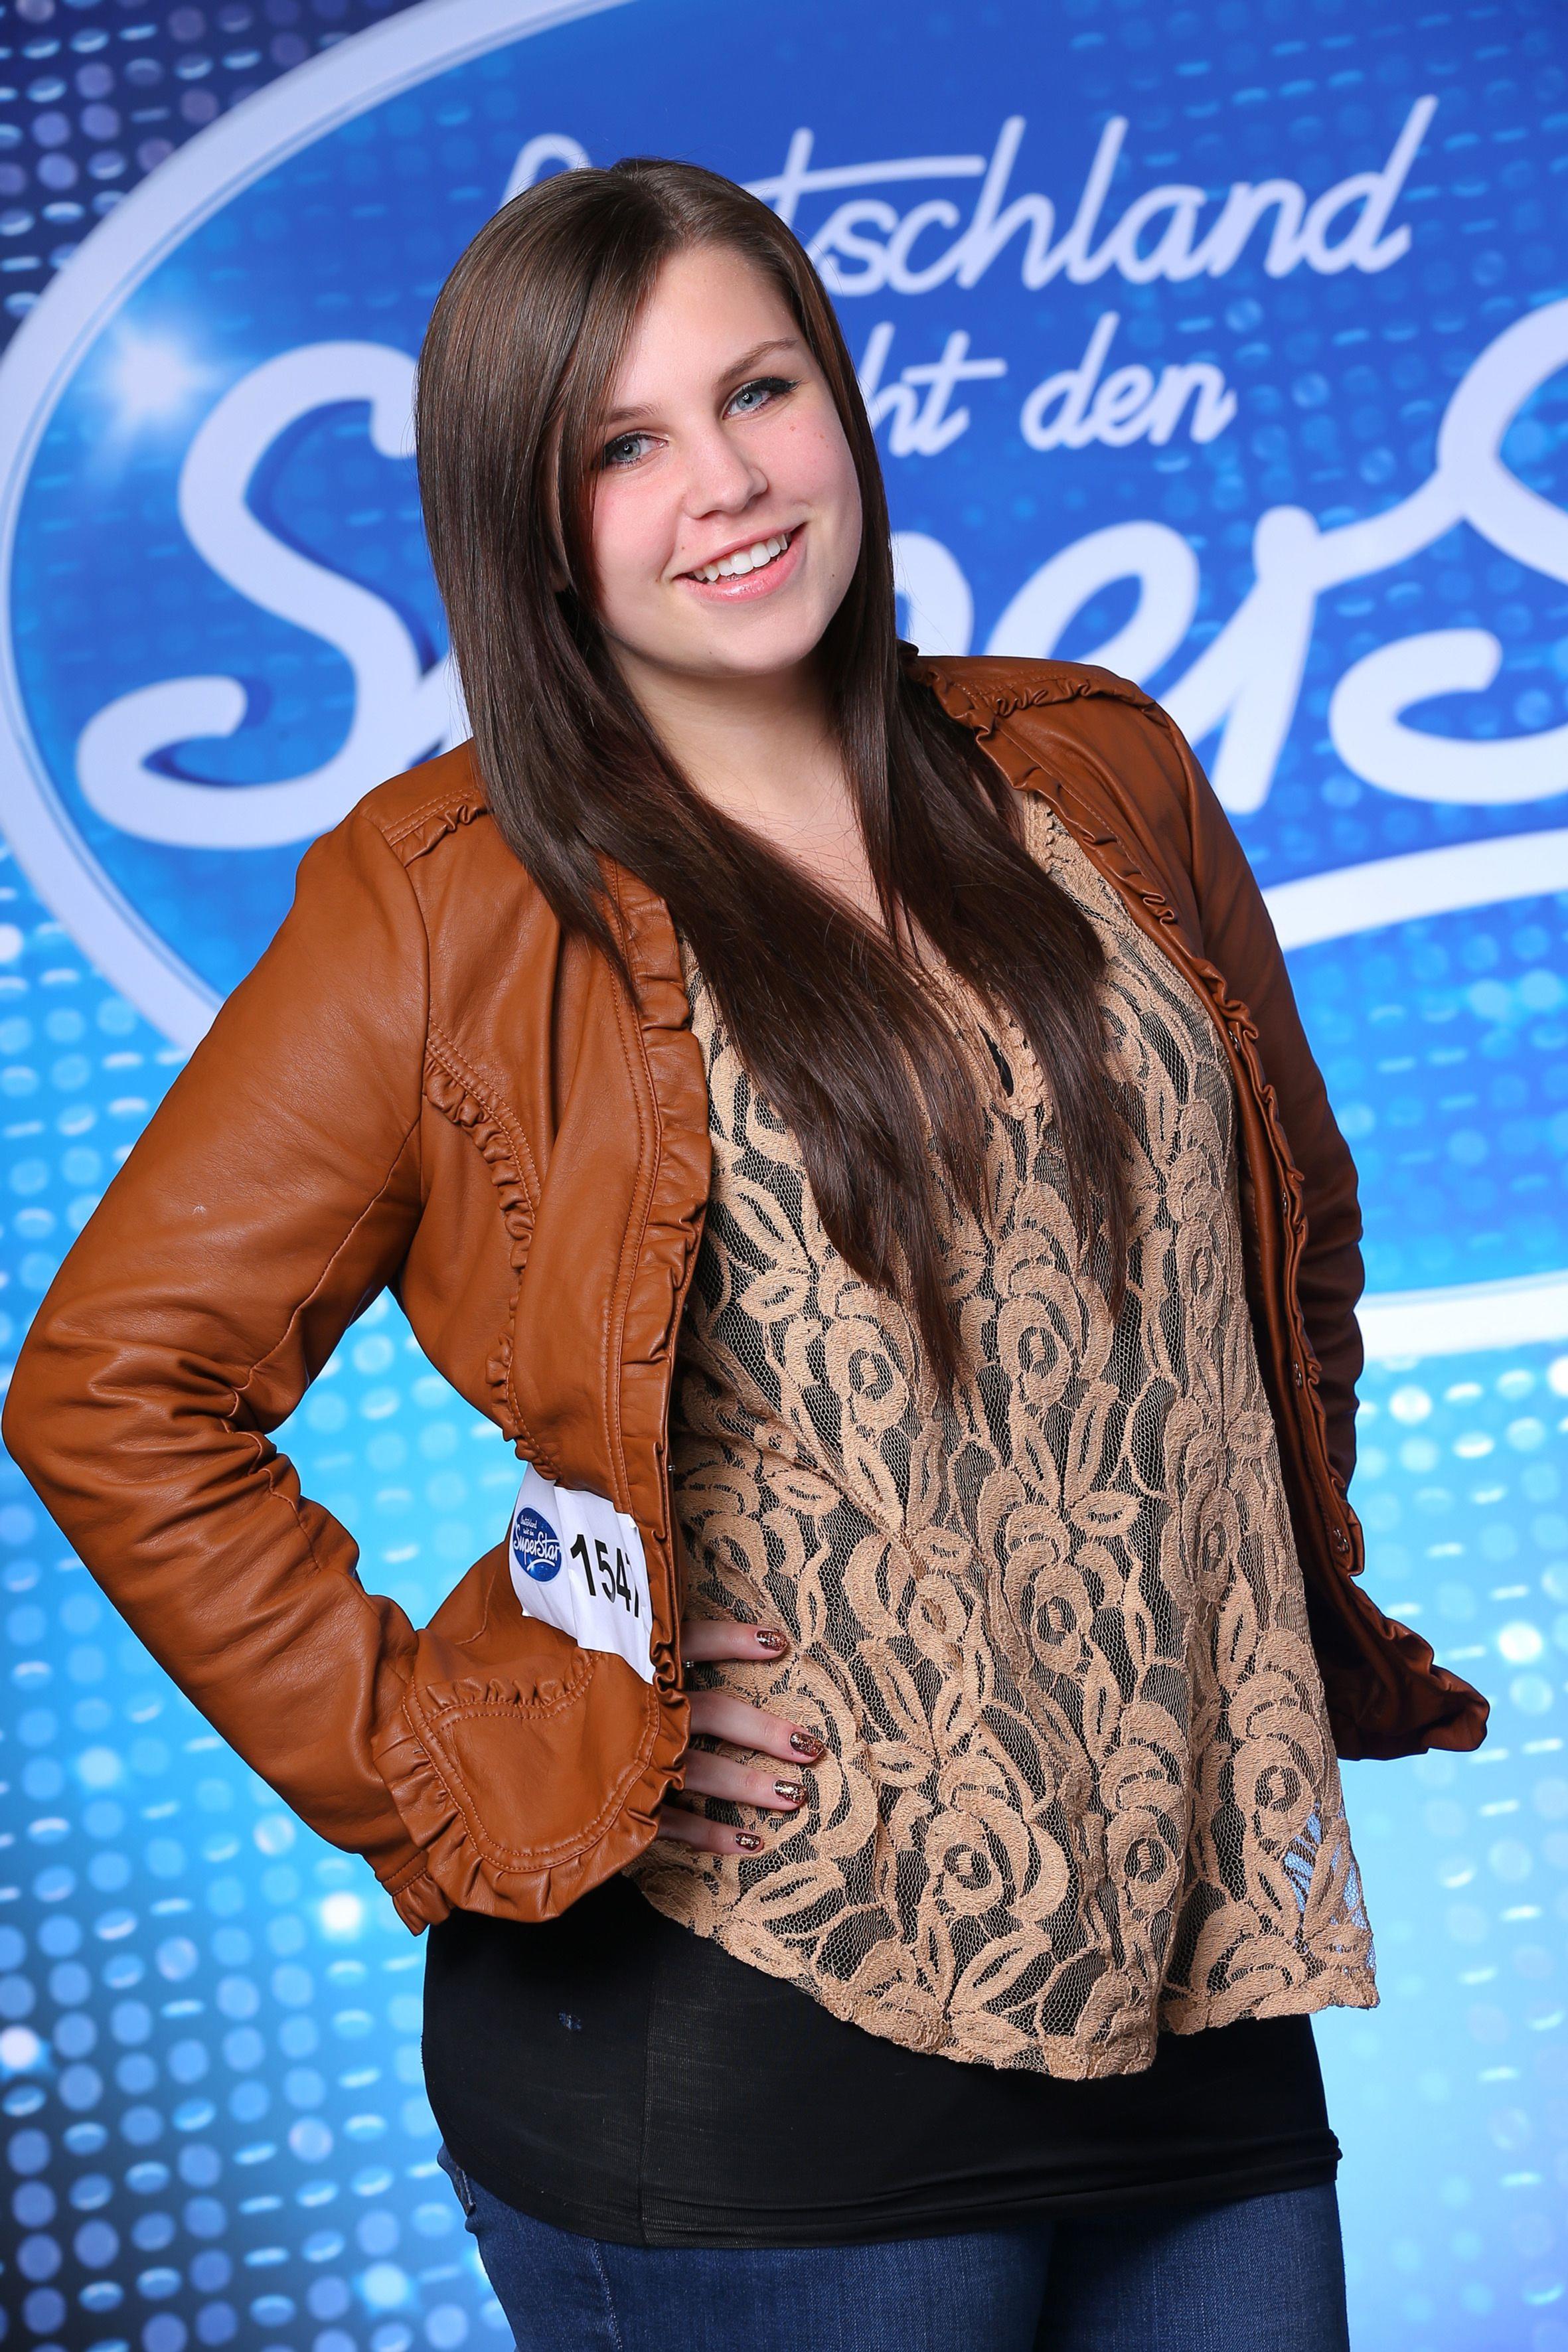 DSDS 2014 - Recall - Jessica Provence